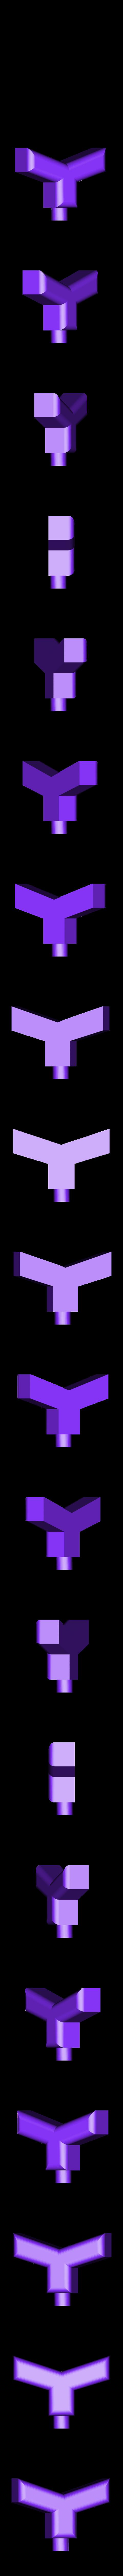 CheveuxV4.STL Download free STL file Mr Patato STRATOMAKER • 3D printing object, boyery